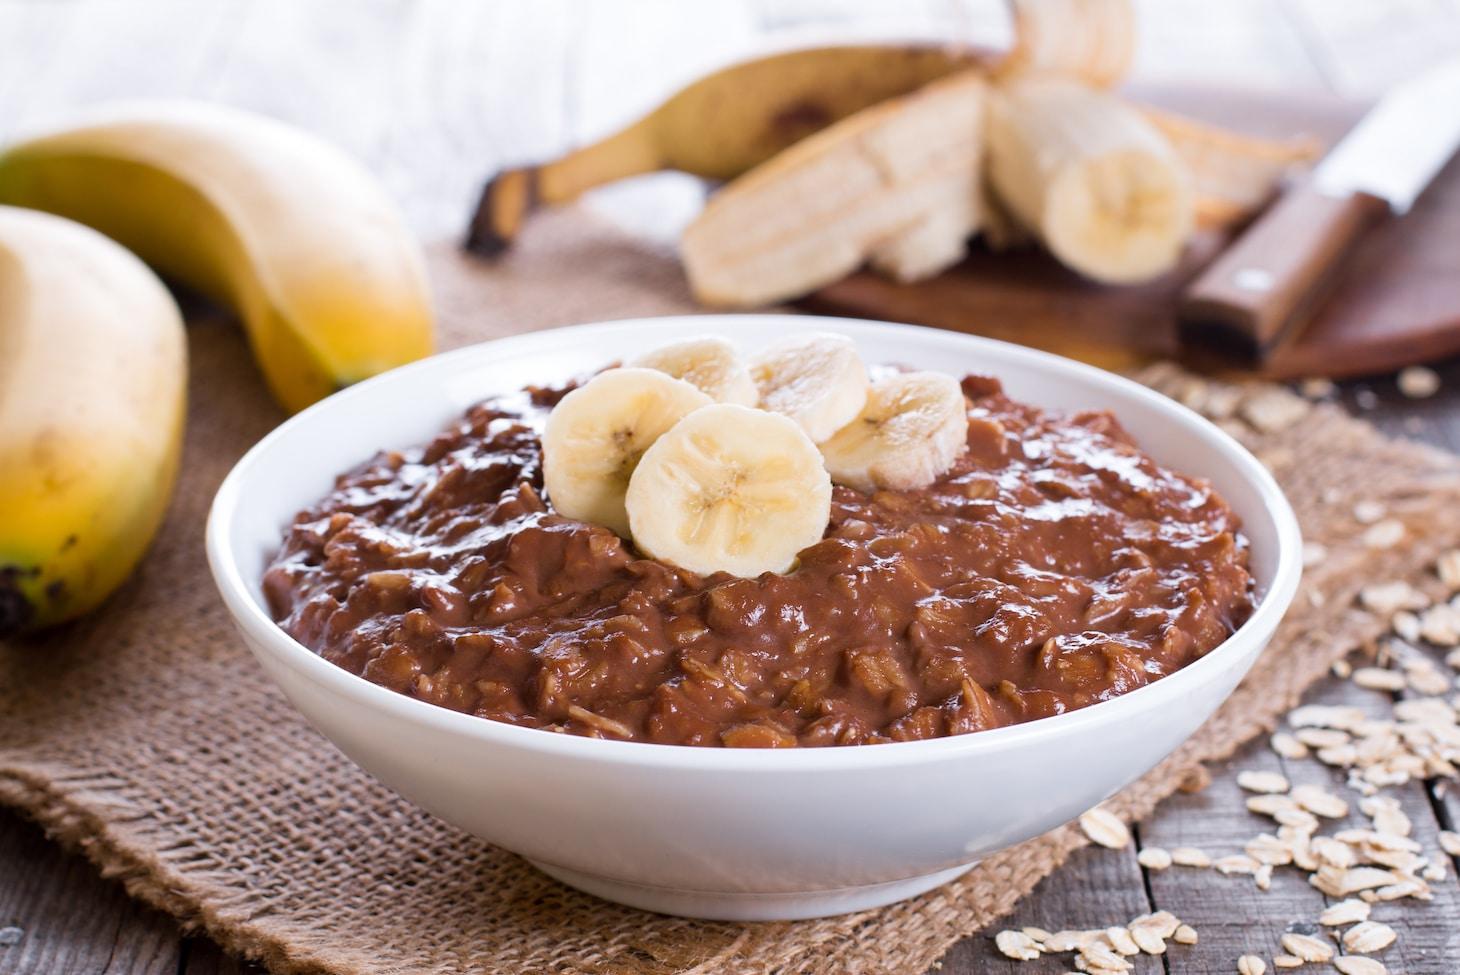 овсяная каша с какао и бананом.jpg